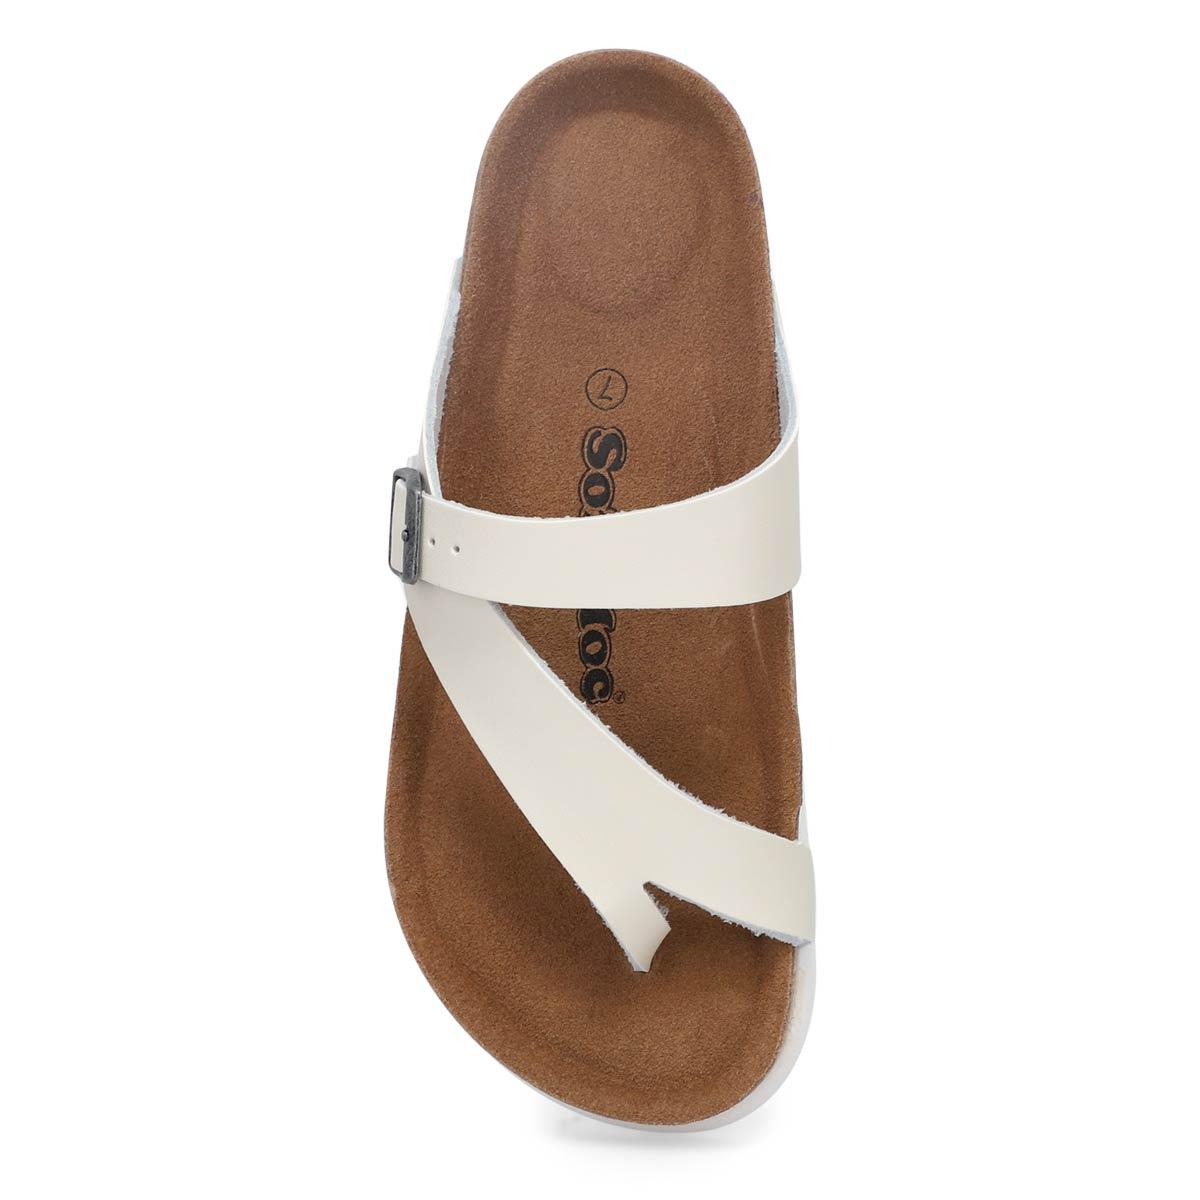 Women's Arwen Sandal - White/Leather